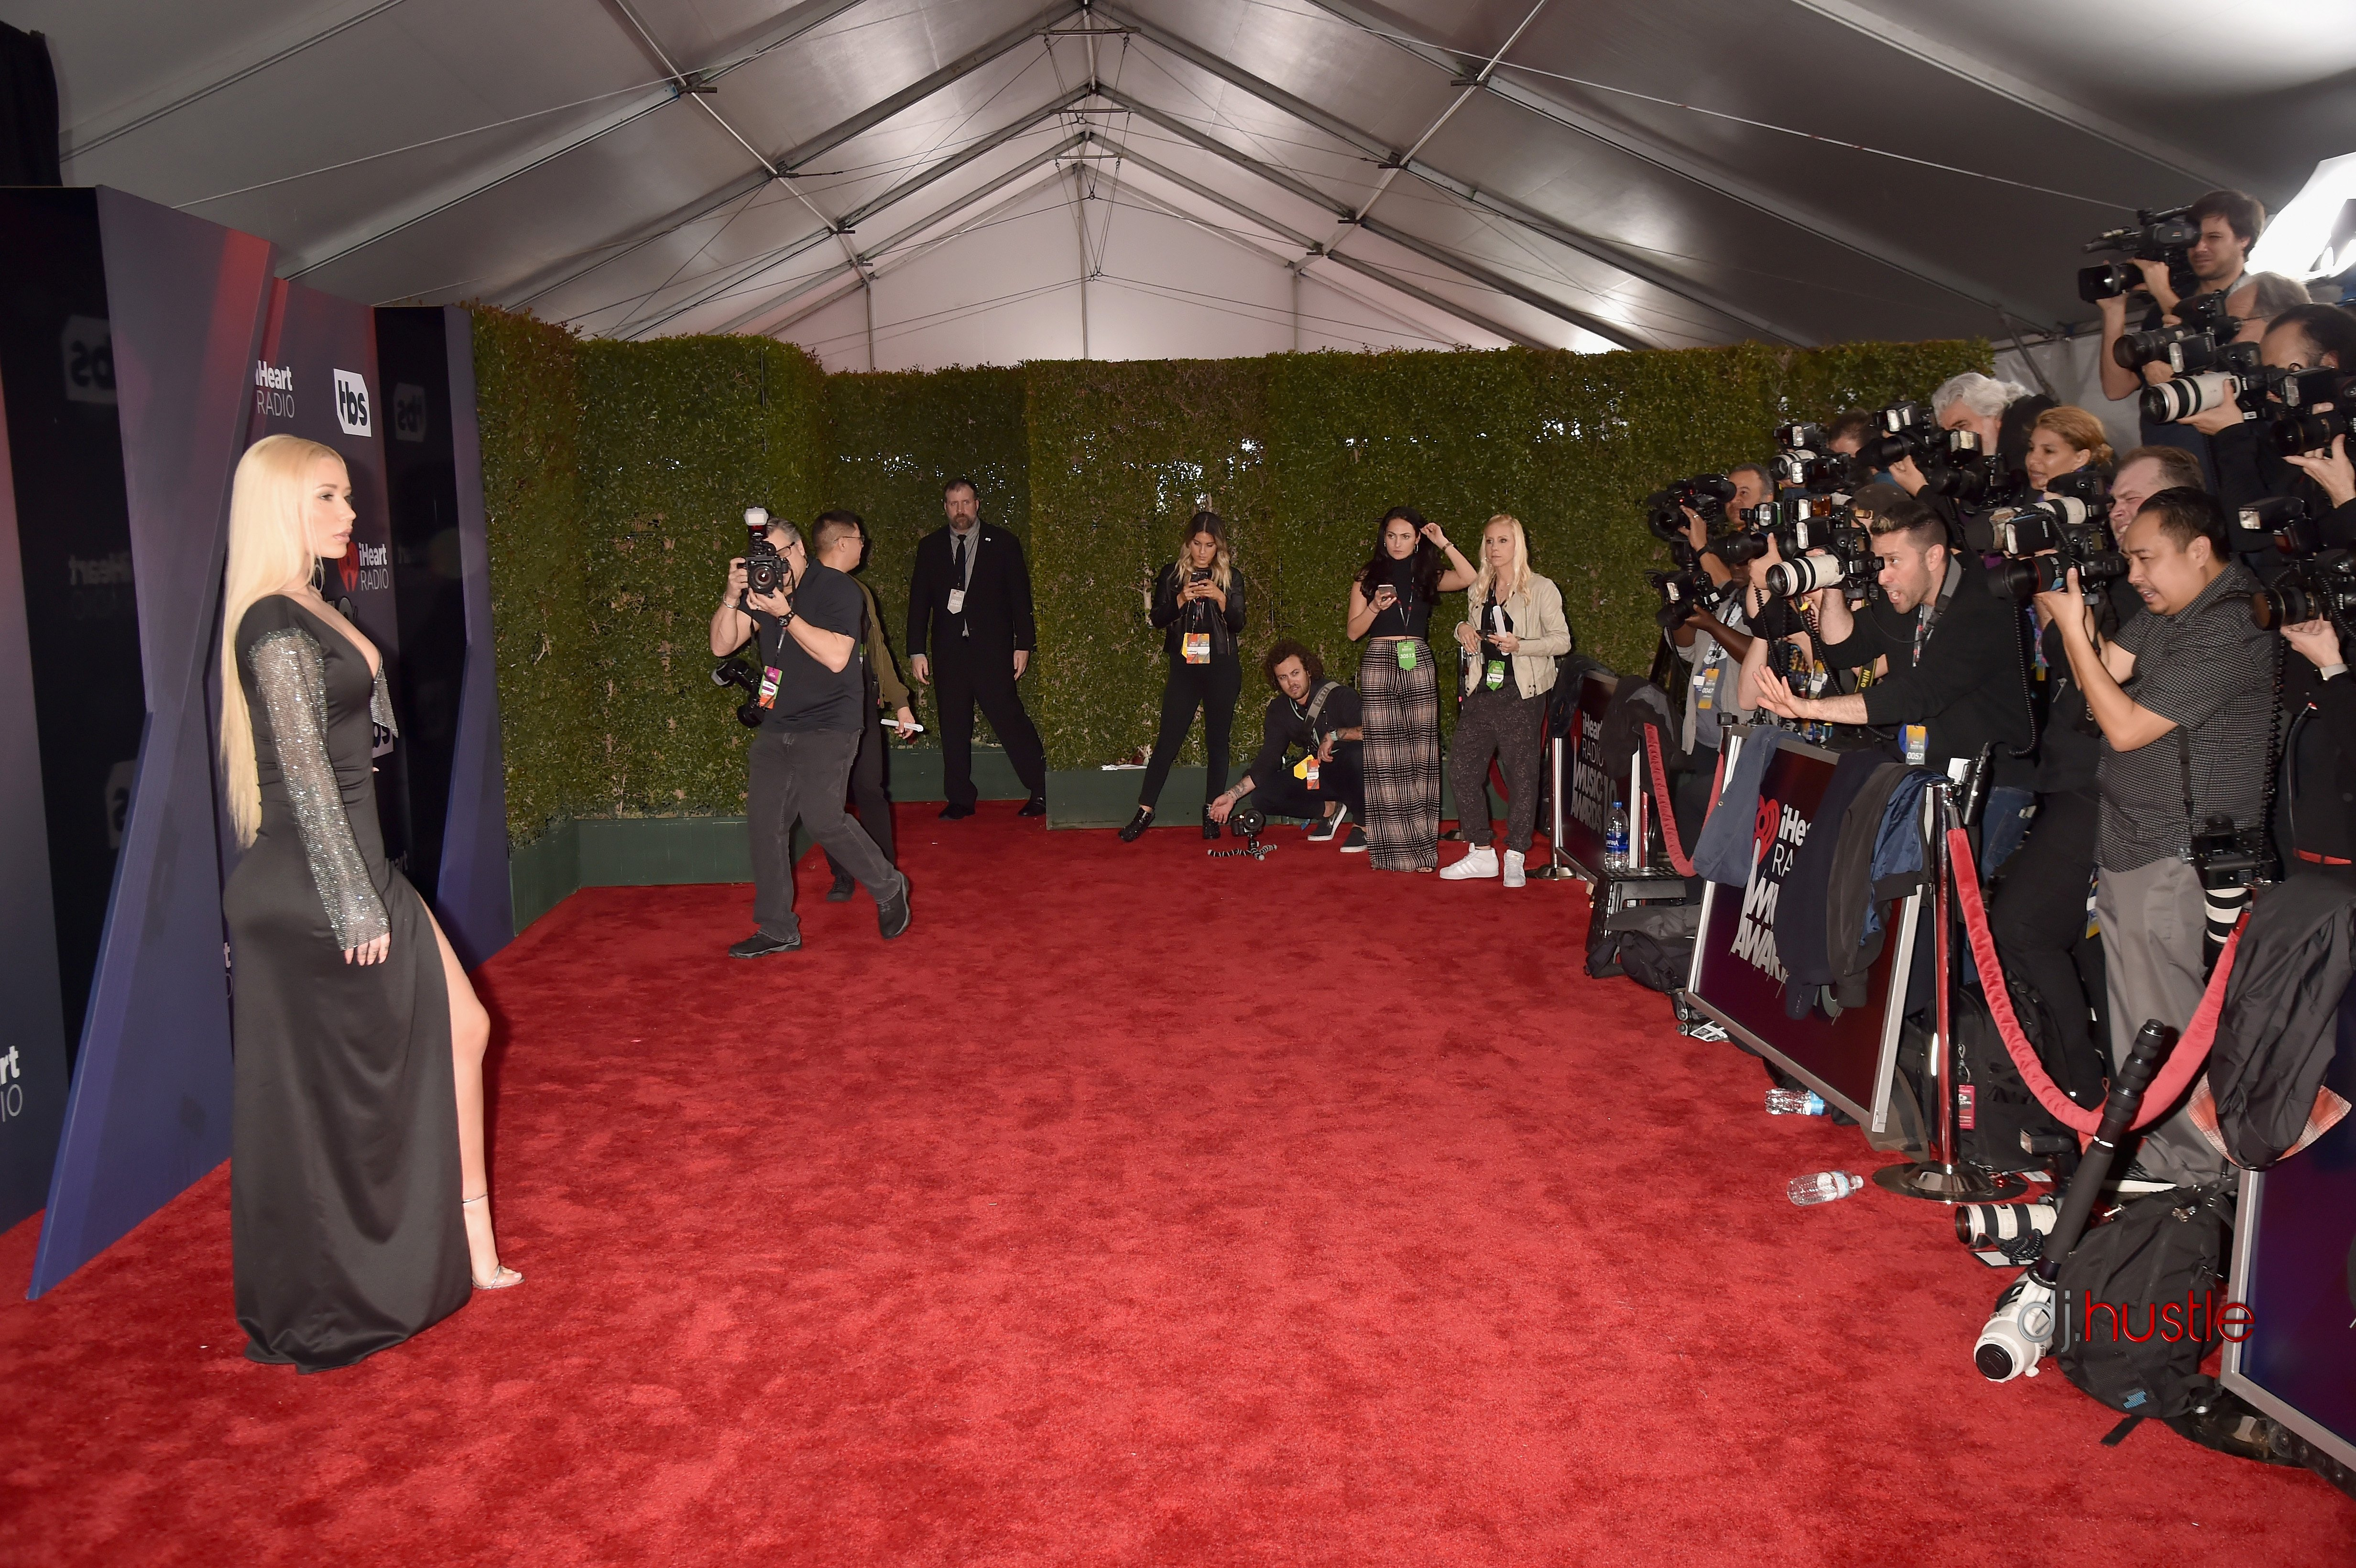 iHeartMedia Celebrates Music's Biggest Stars iHeartRadio Music Awards Media Celebrates Music's Biggest Stars iHeartRadio Music Awards Iggy Azalea arrives at the 2018(Photo by DJ Hustle iHeartMedia)